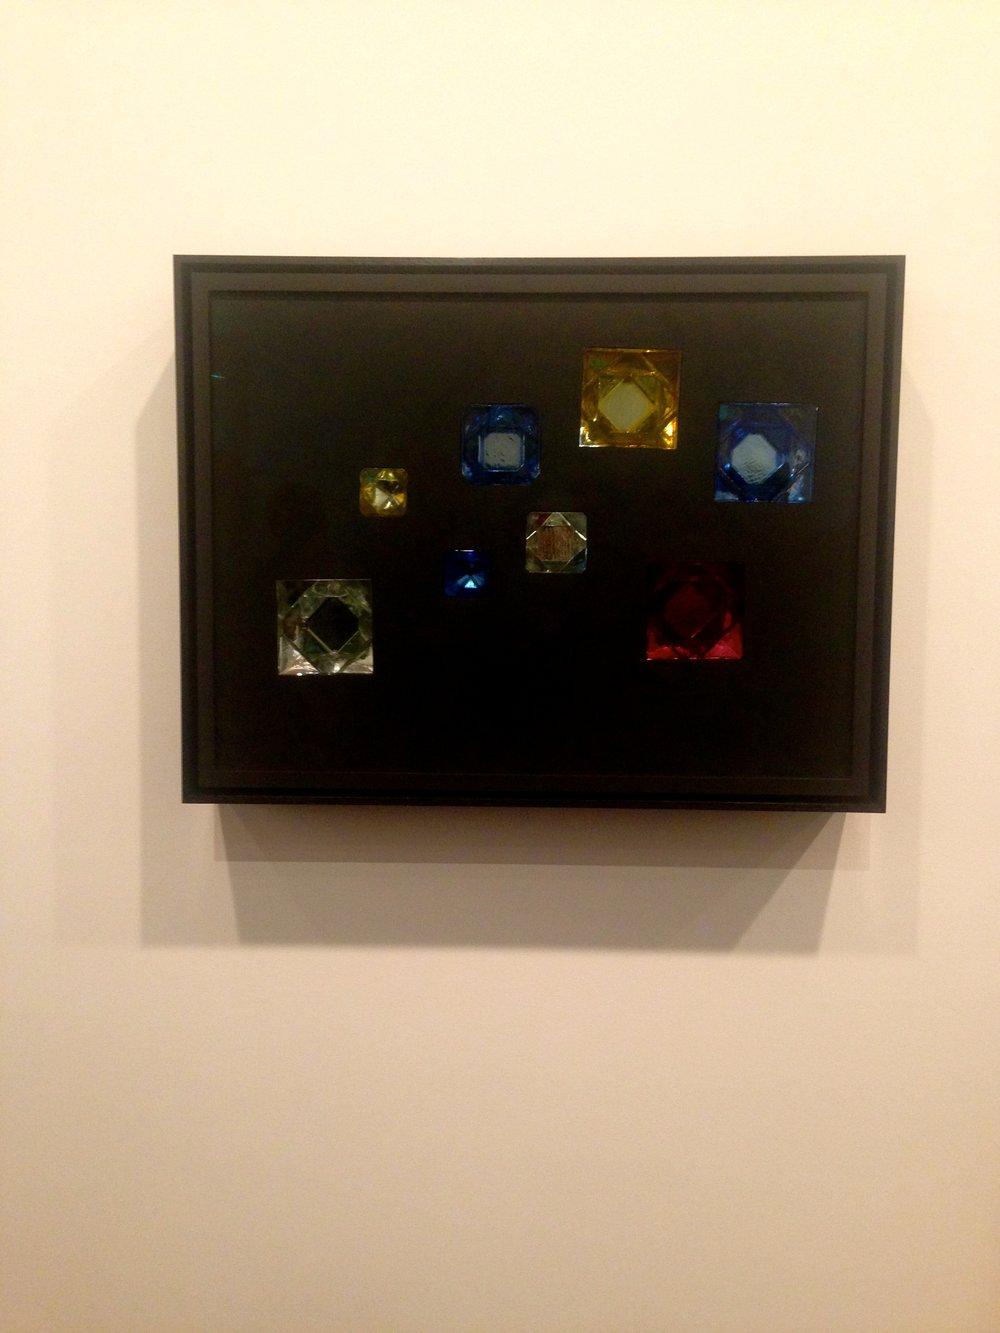 Andrea Rosen, Josiah McElheny, Crystalline Prism Painting VI, 2015